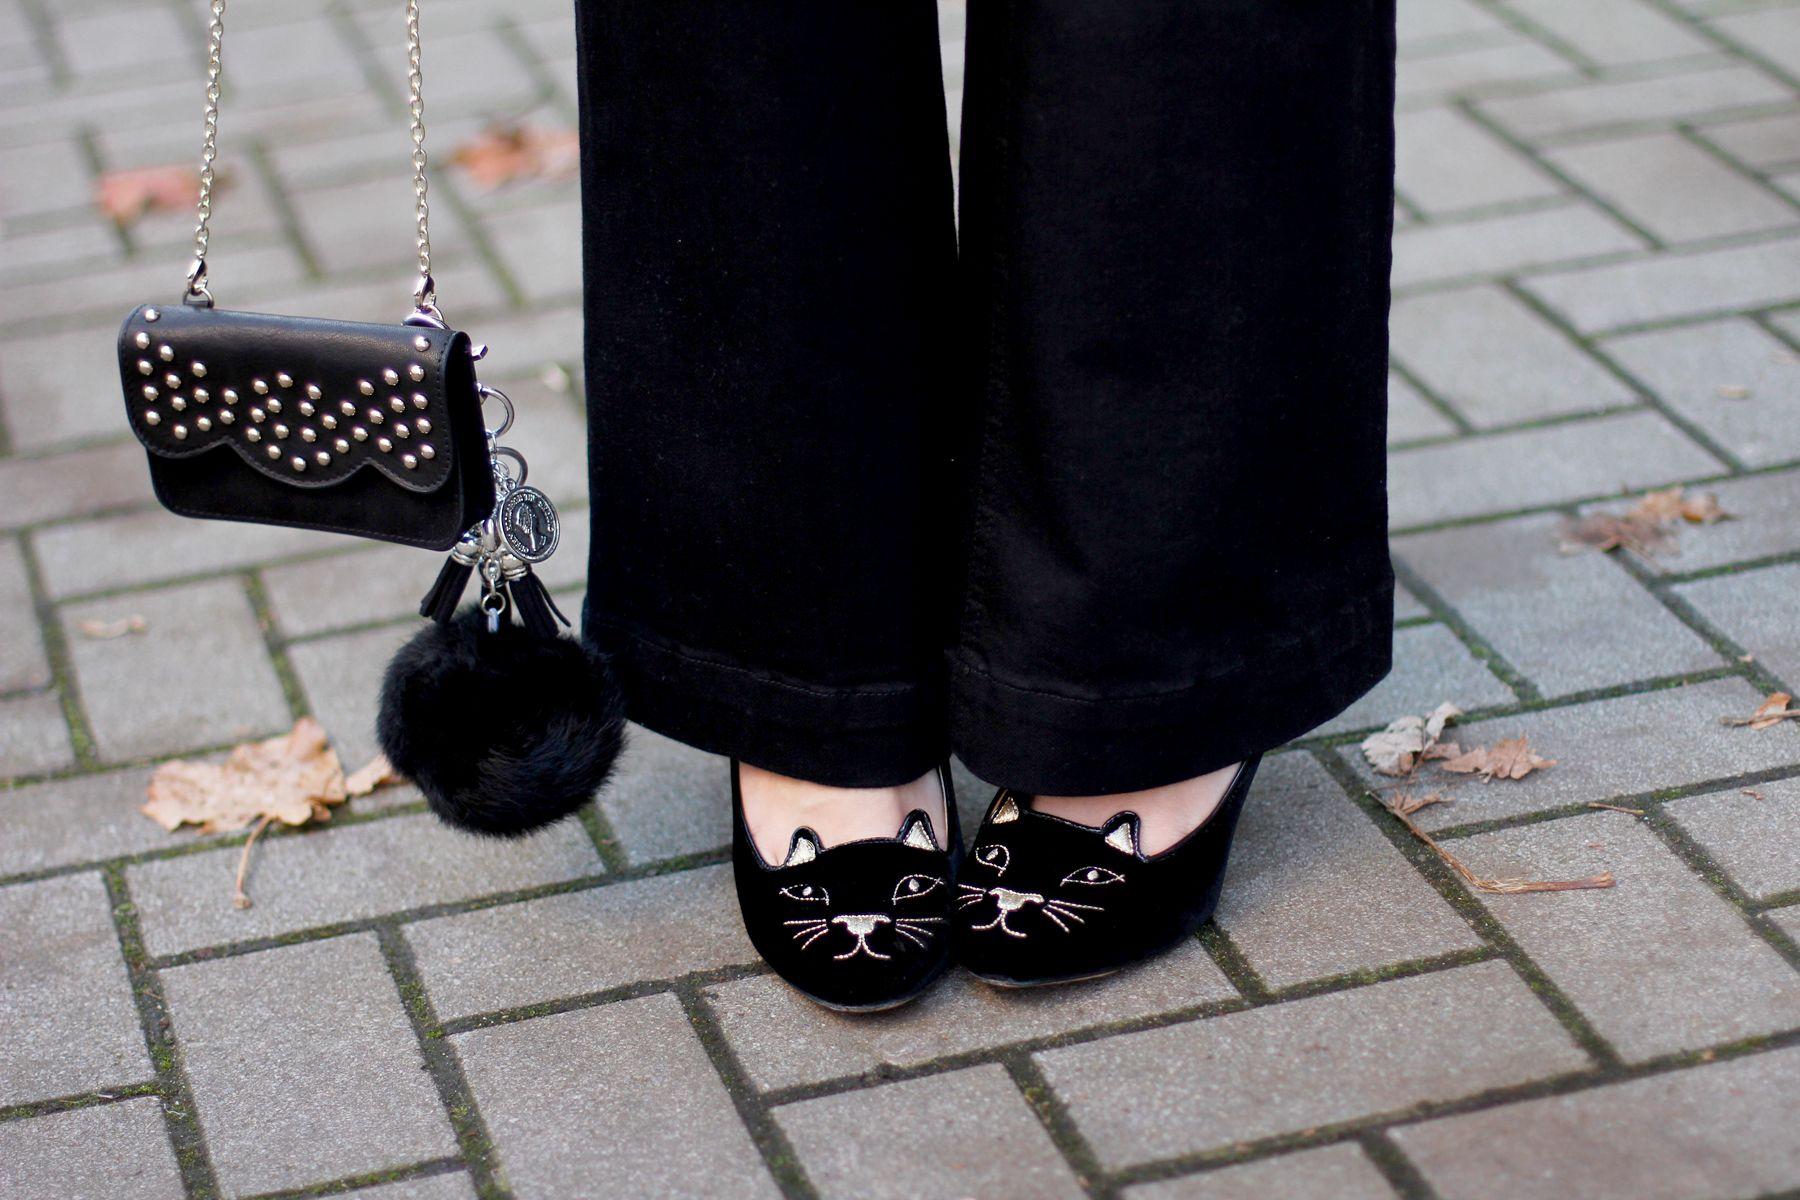 #BettyxLancaster #pompom #cat #bag #black #lancasterparis #lancaster (Pic by Cats & Dogs Blog)